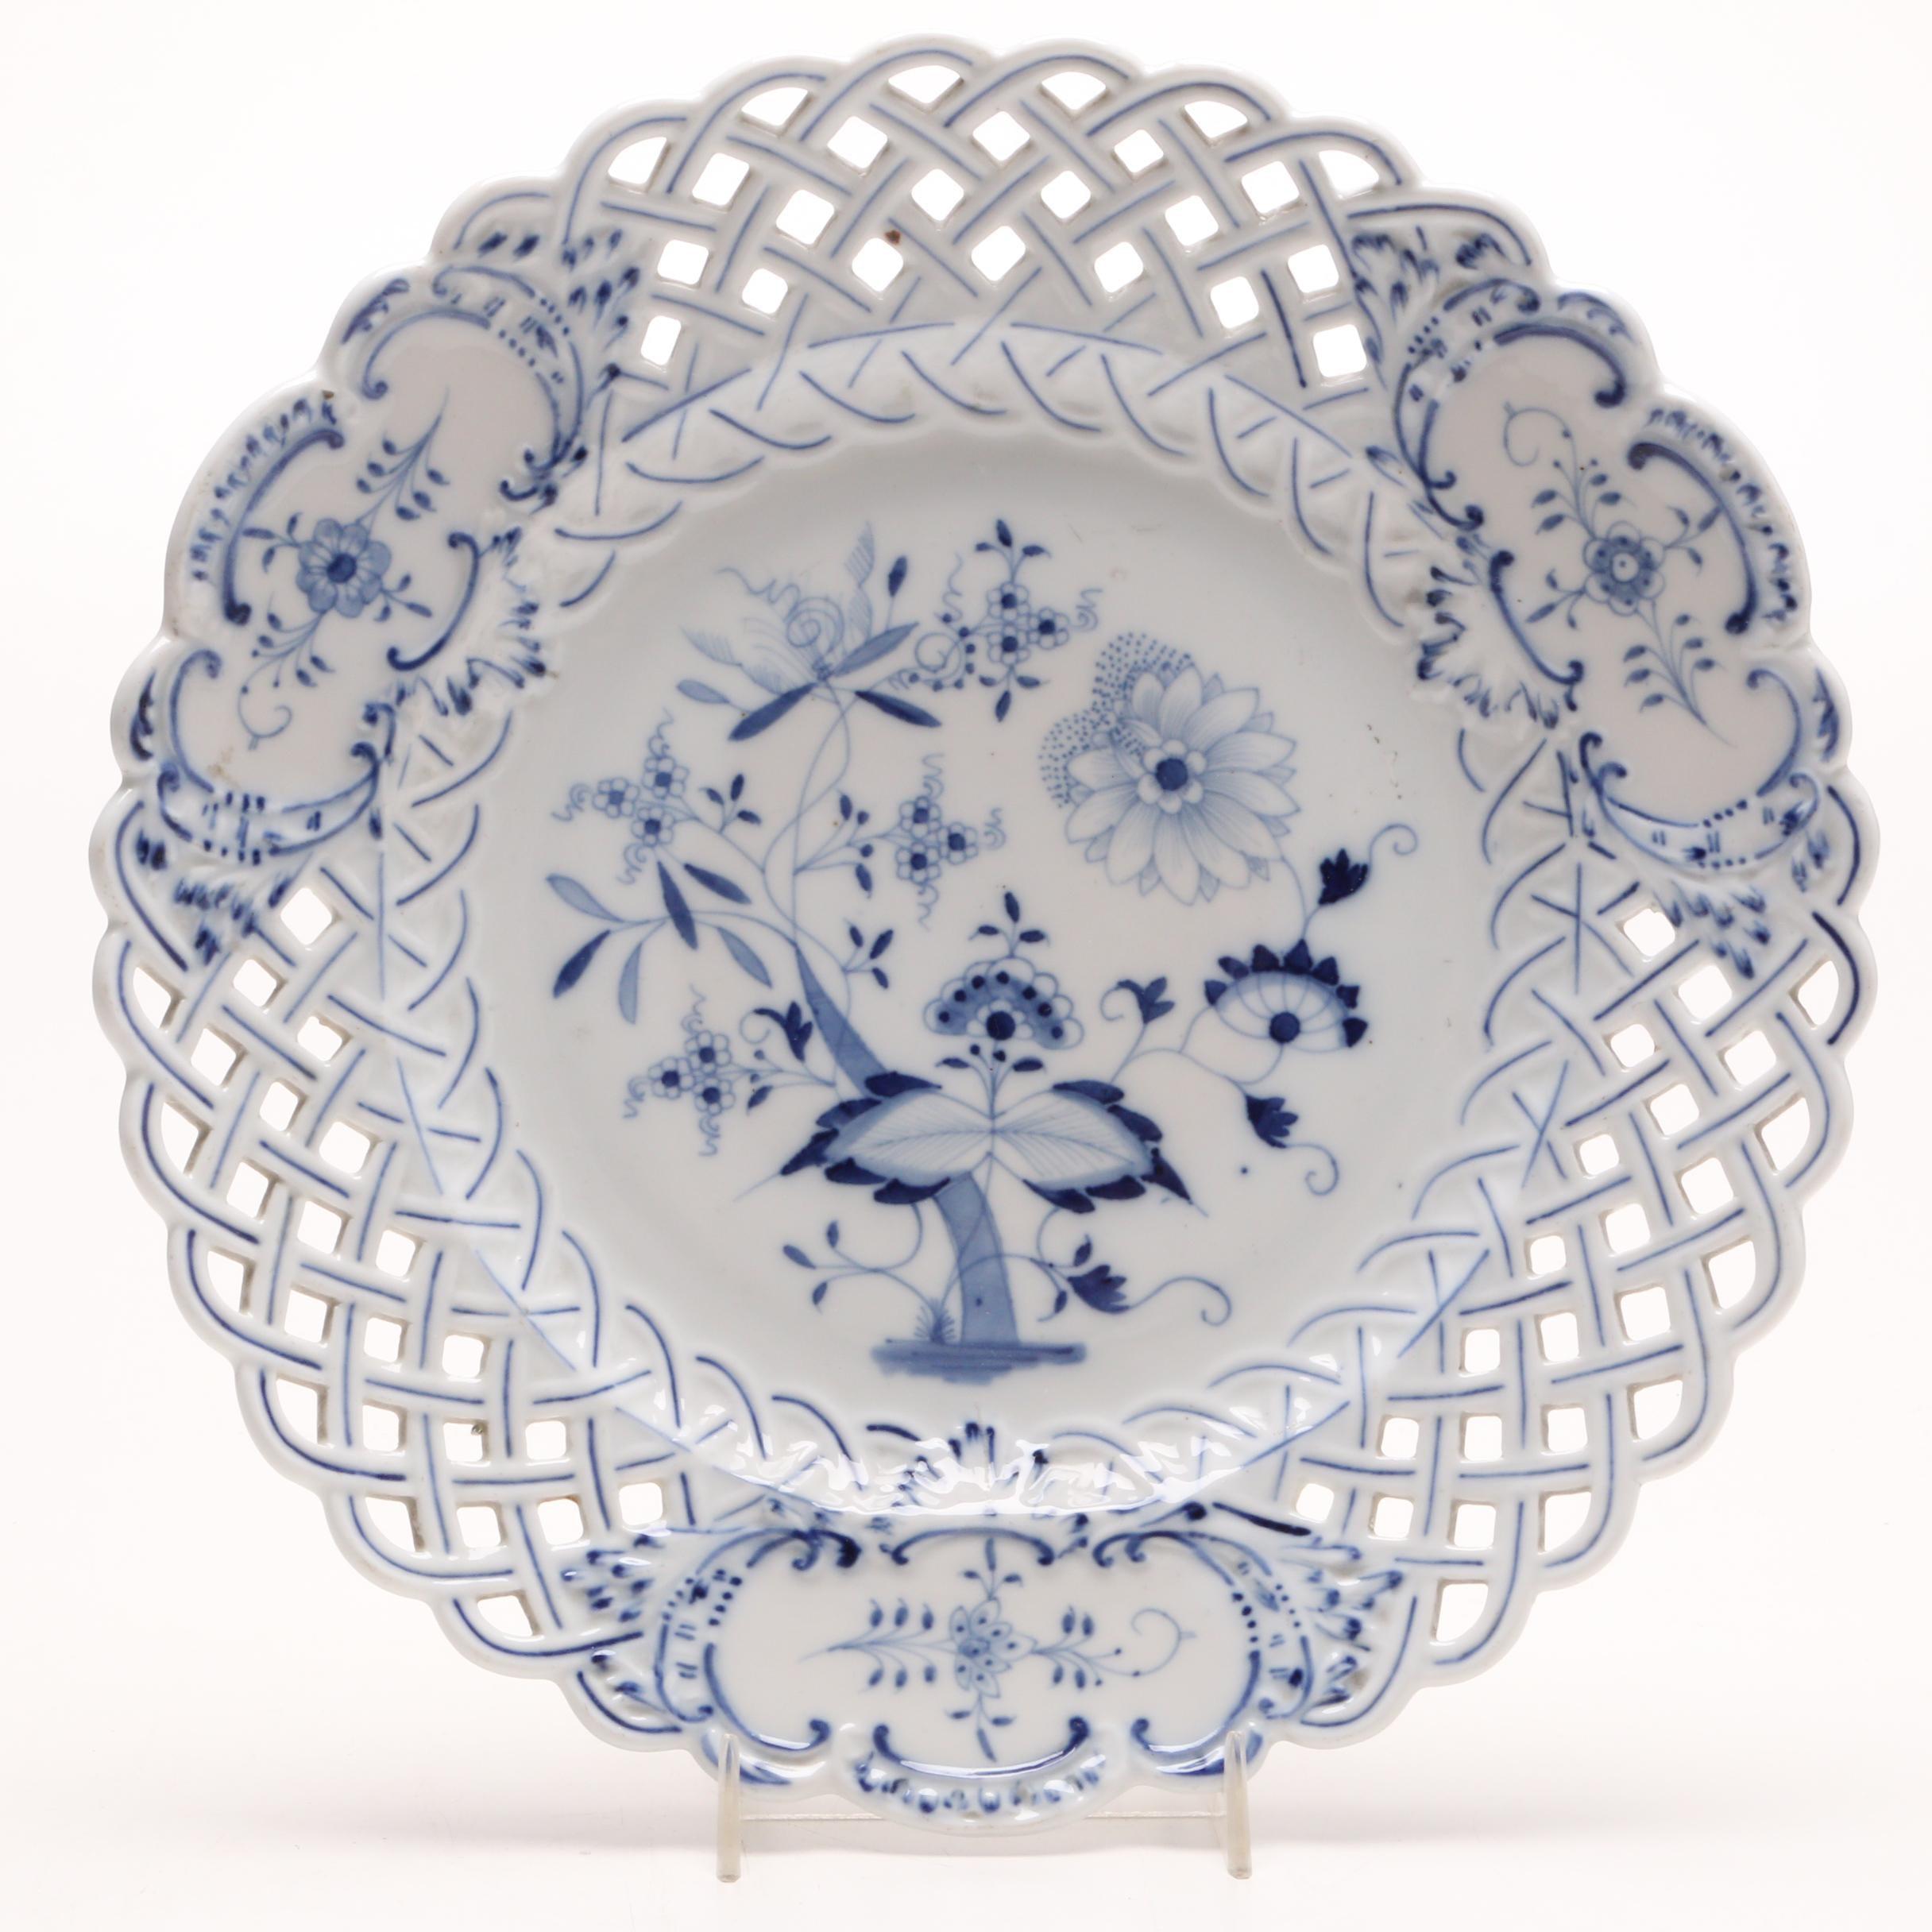 "Carl Theichert Meissen Stove ""Blue Onion"" Porcelain Plate, Circa 1882-1929"